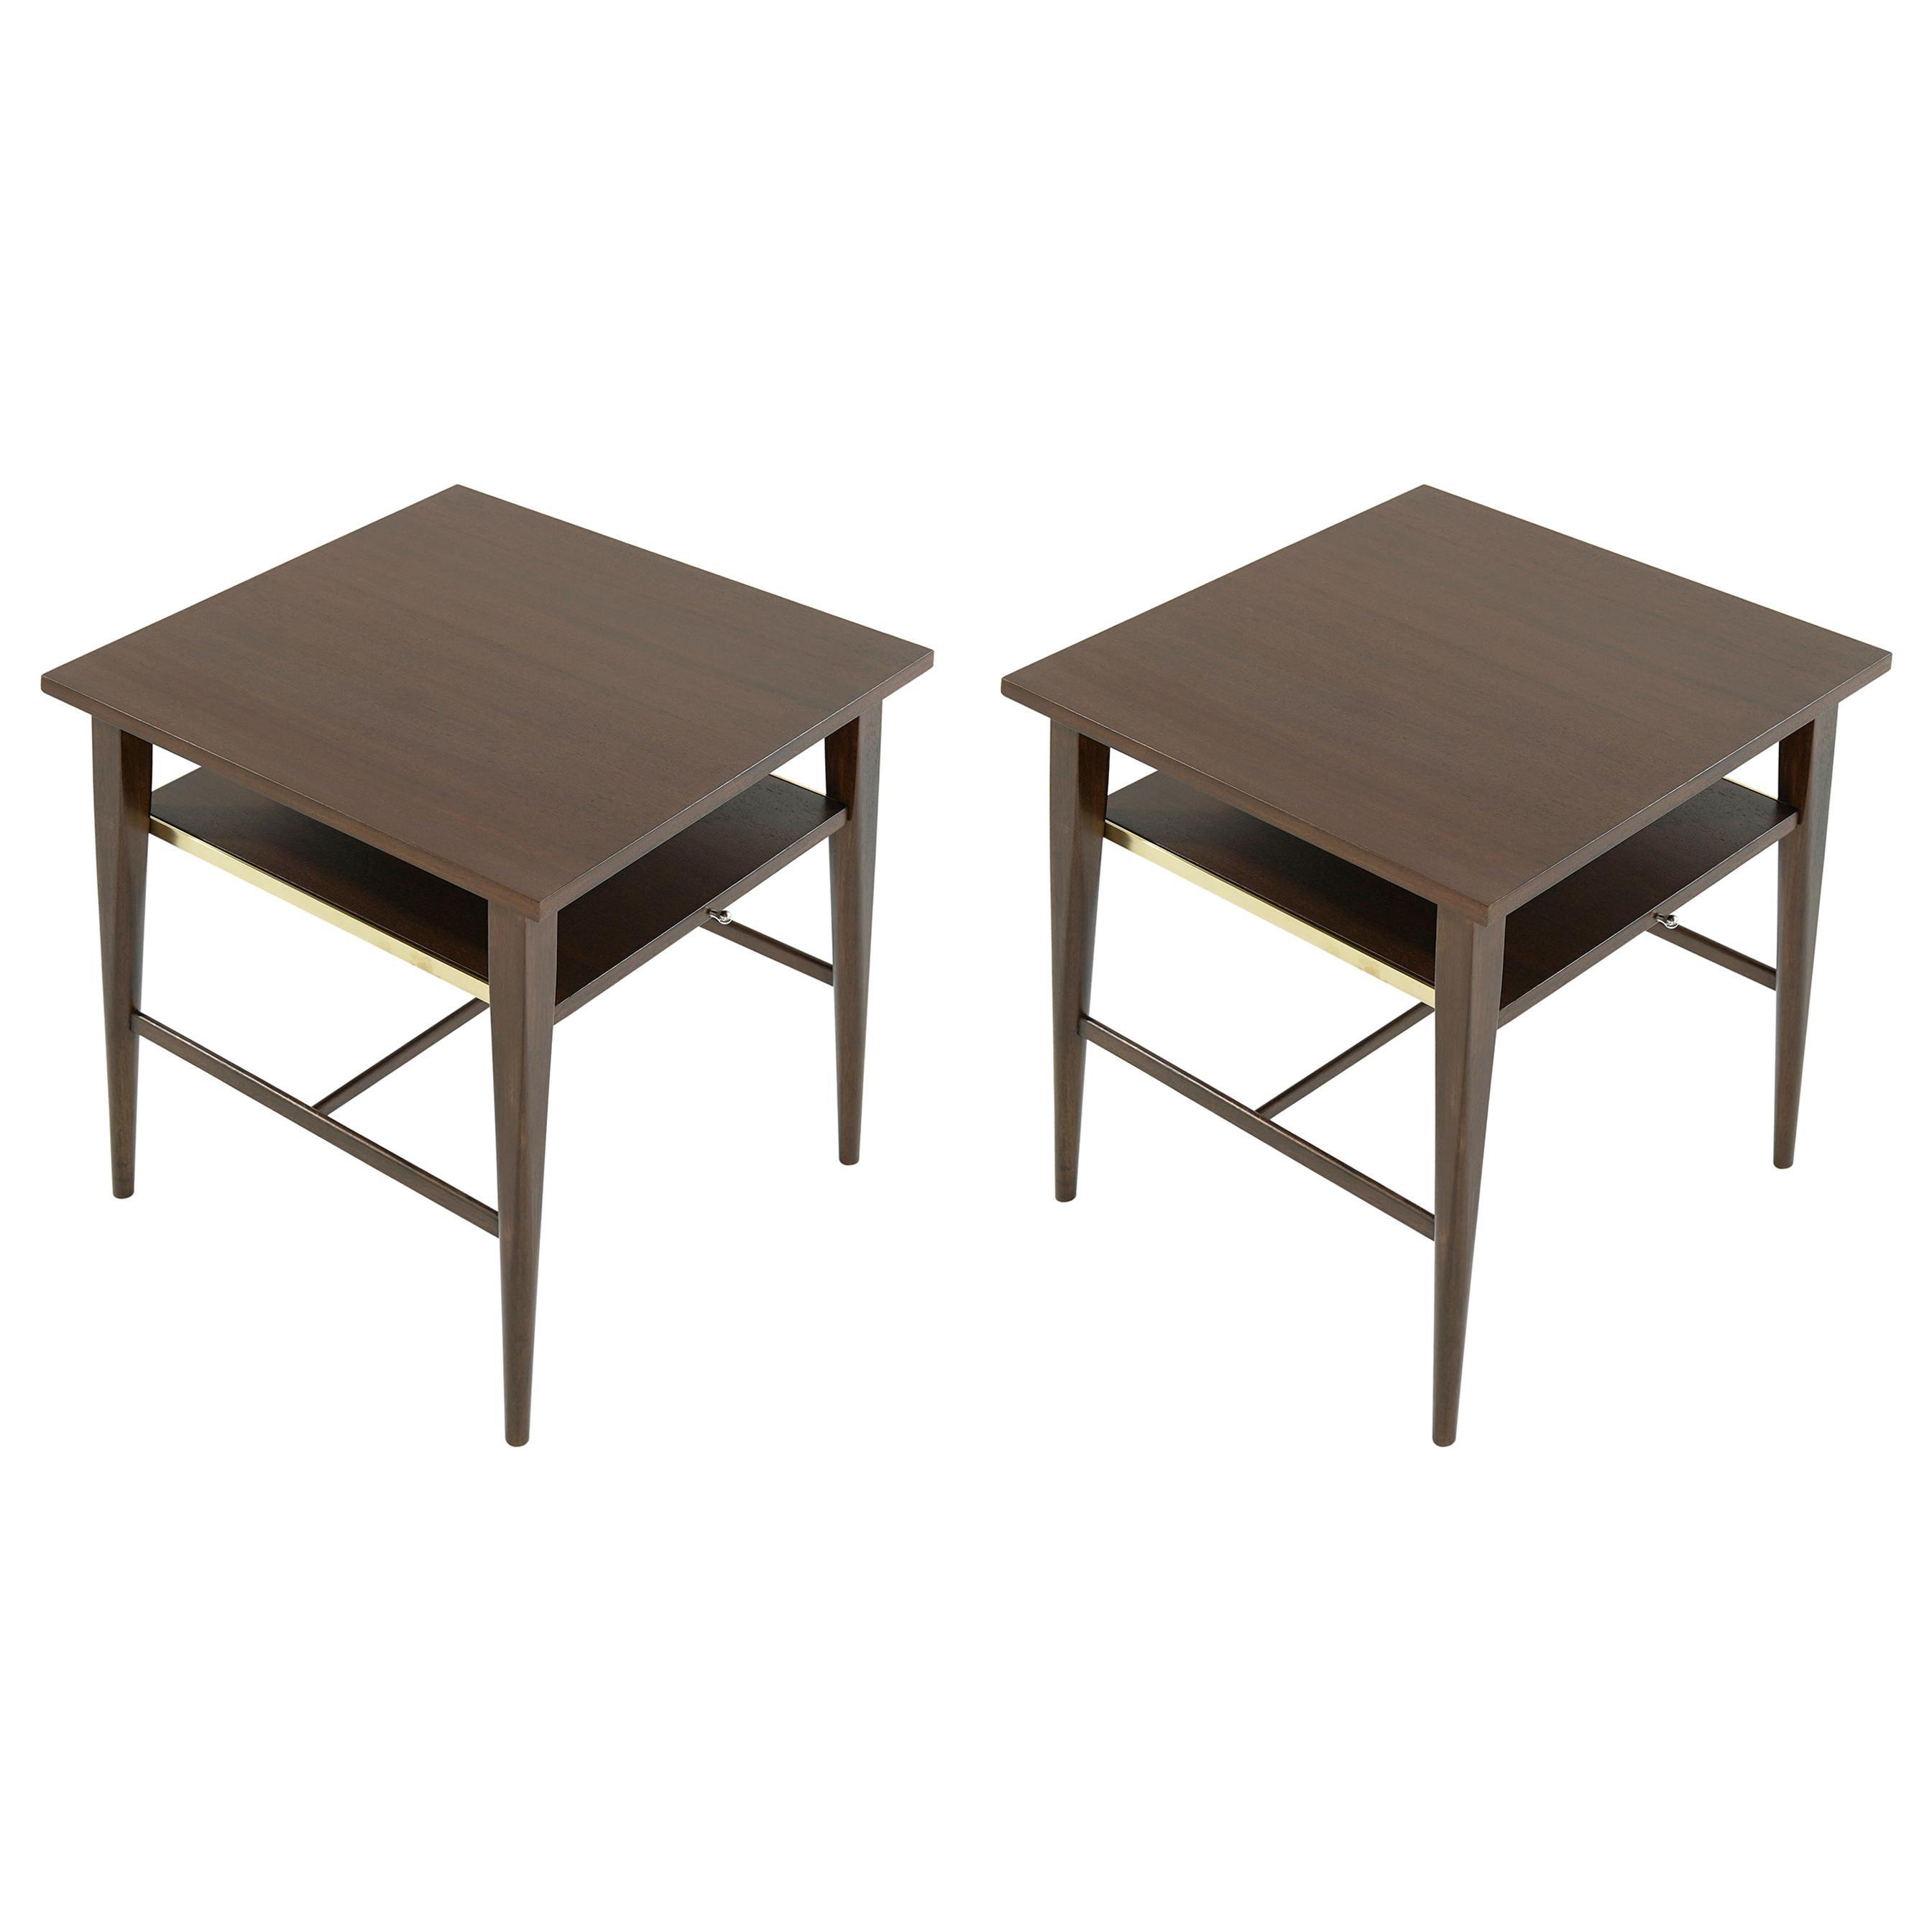 Paul McCobb End Tables, Calvin Group, circa 1950s